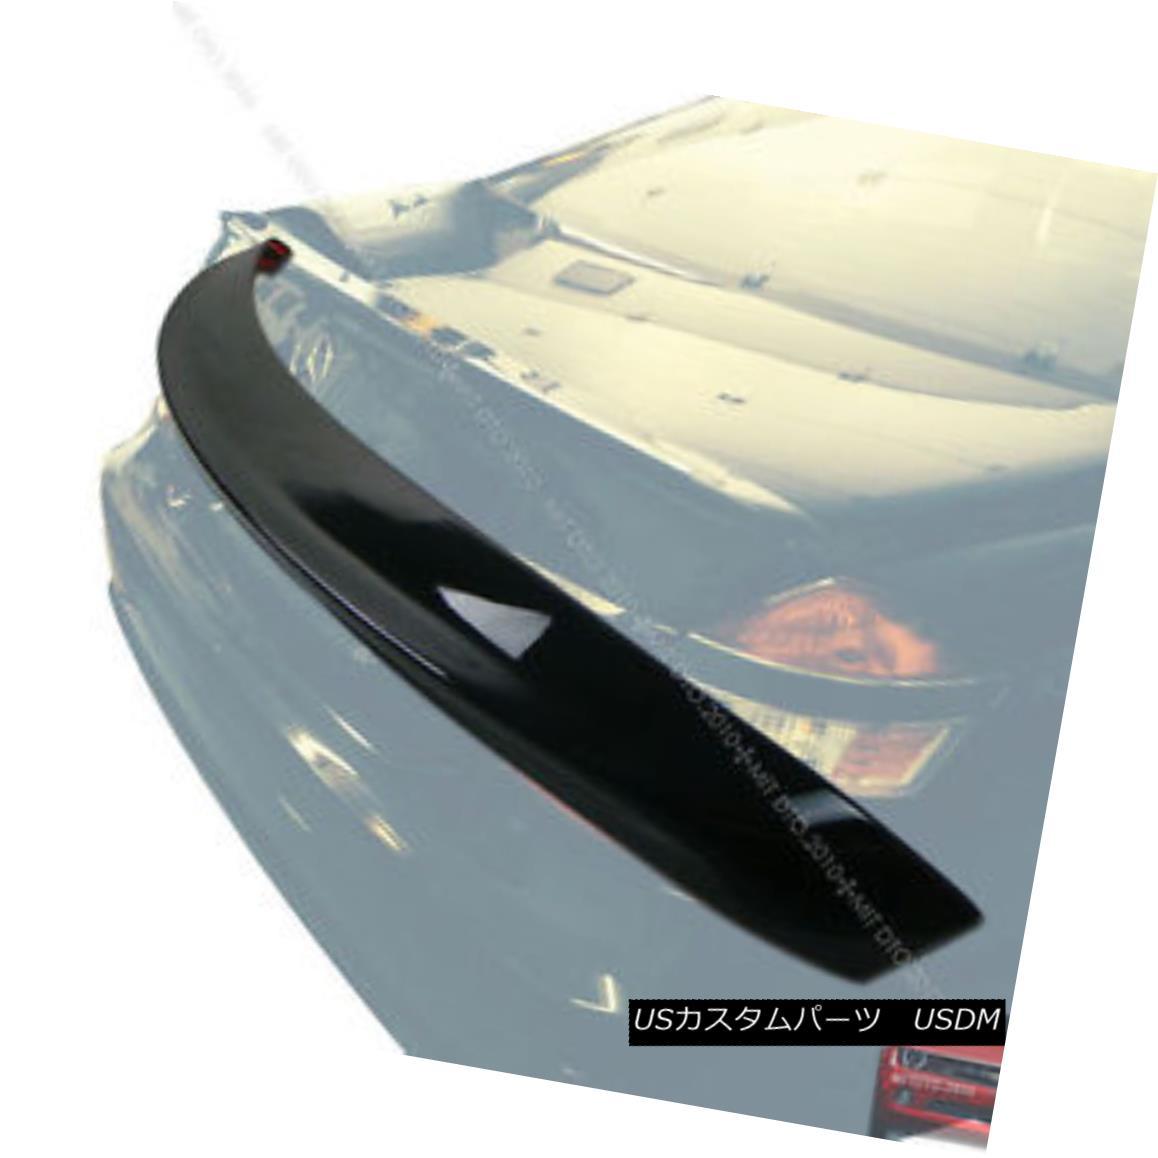 PAINTED For Mercedes benz E-Class W212 sedan Rear Roof Spoiler E350 E550 #040